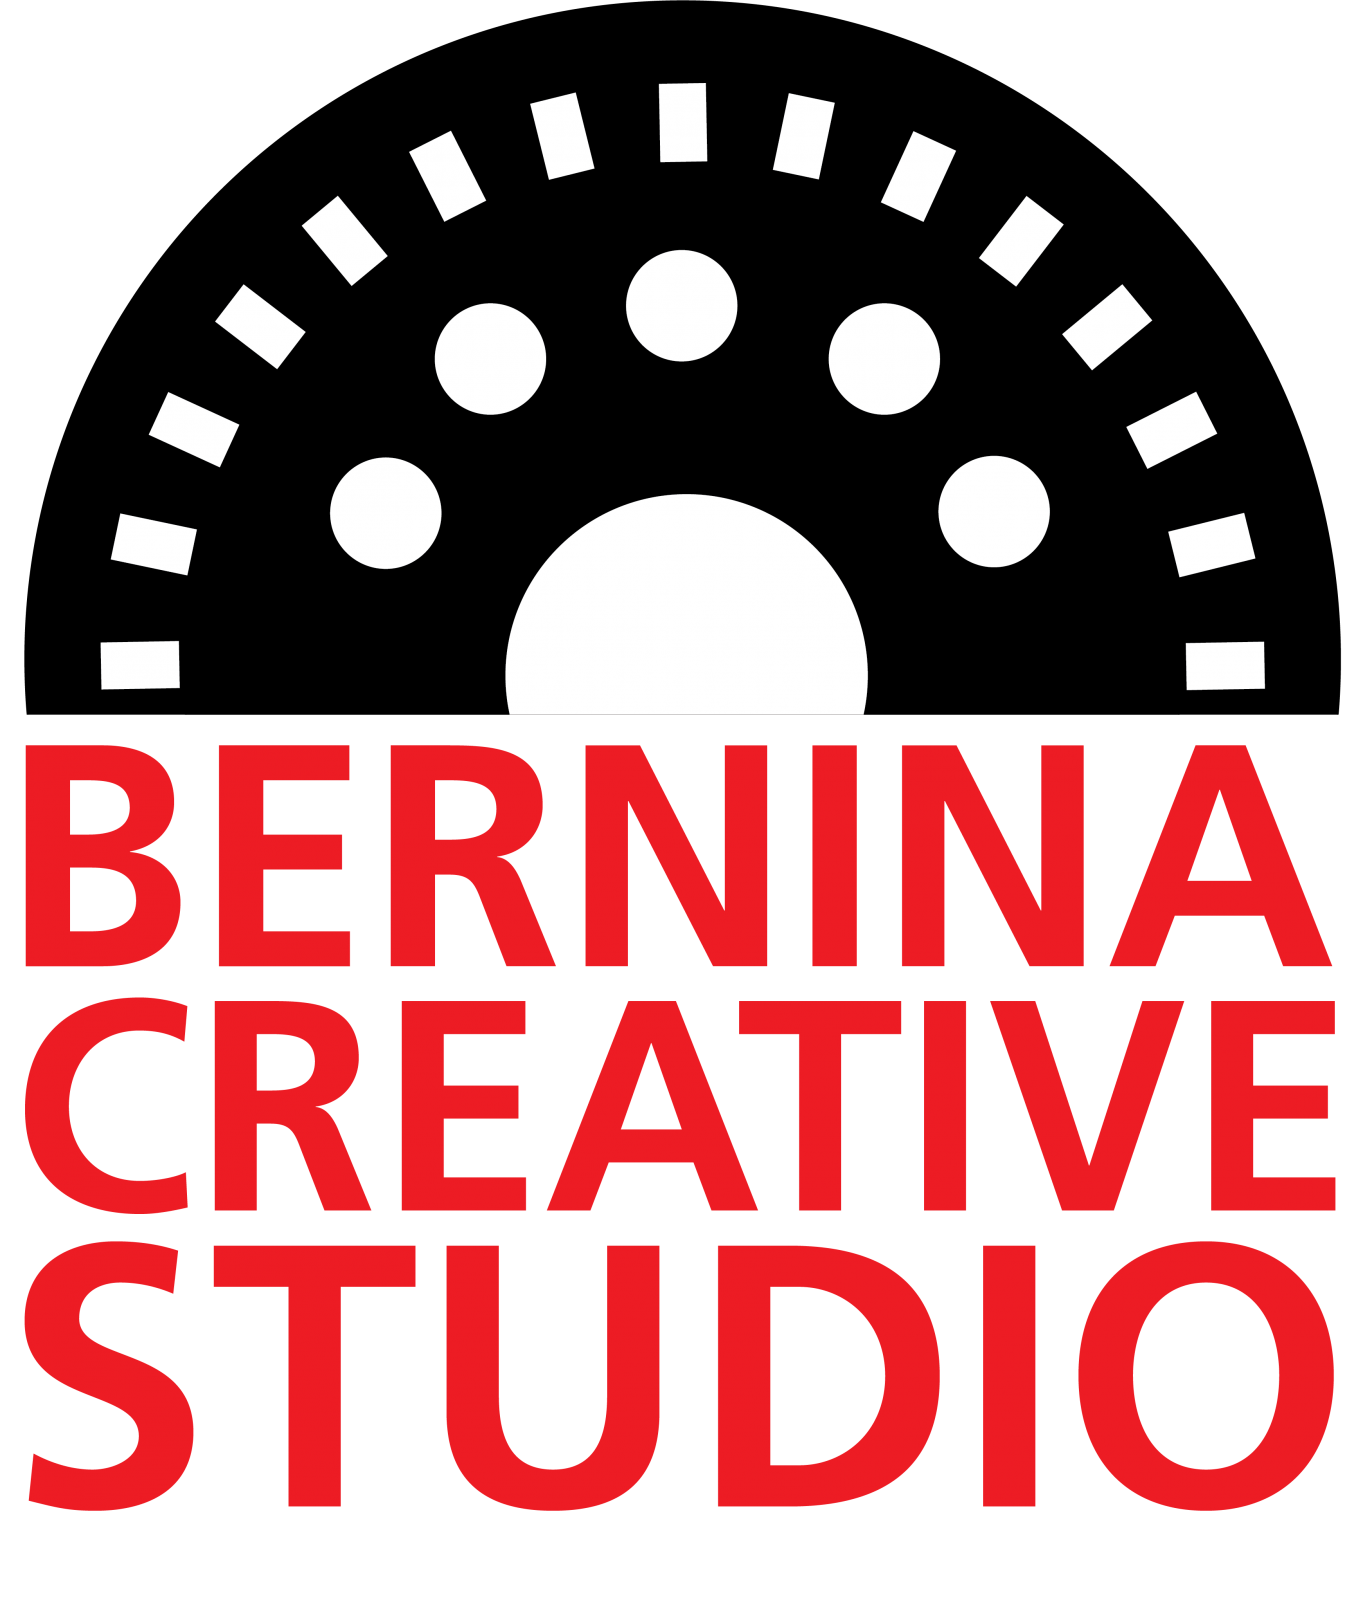 BERNINA Creative Studio 2020